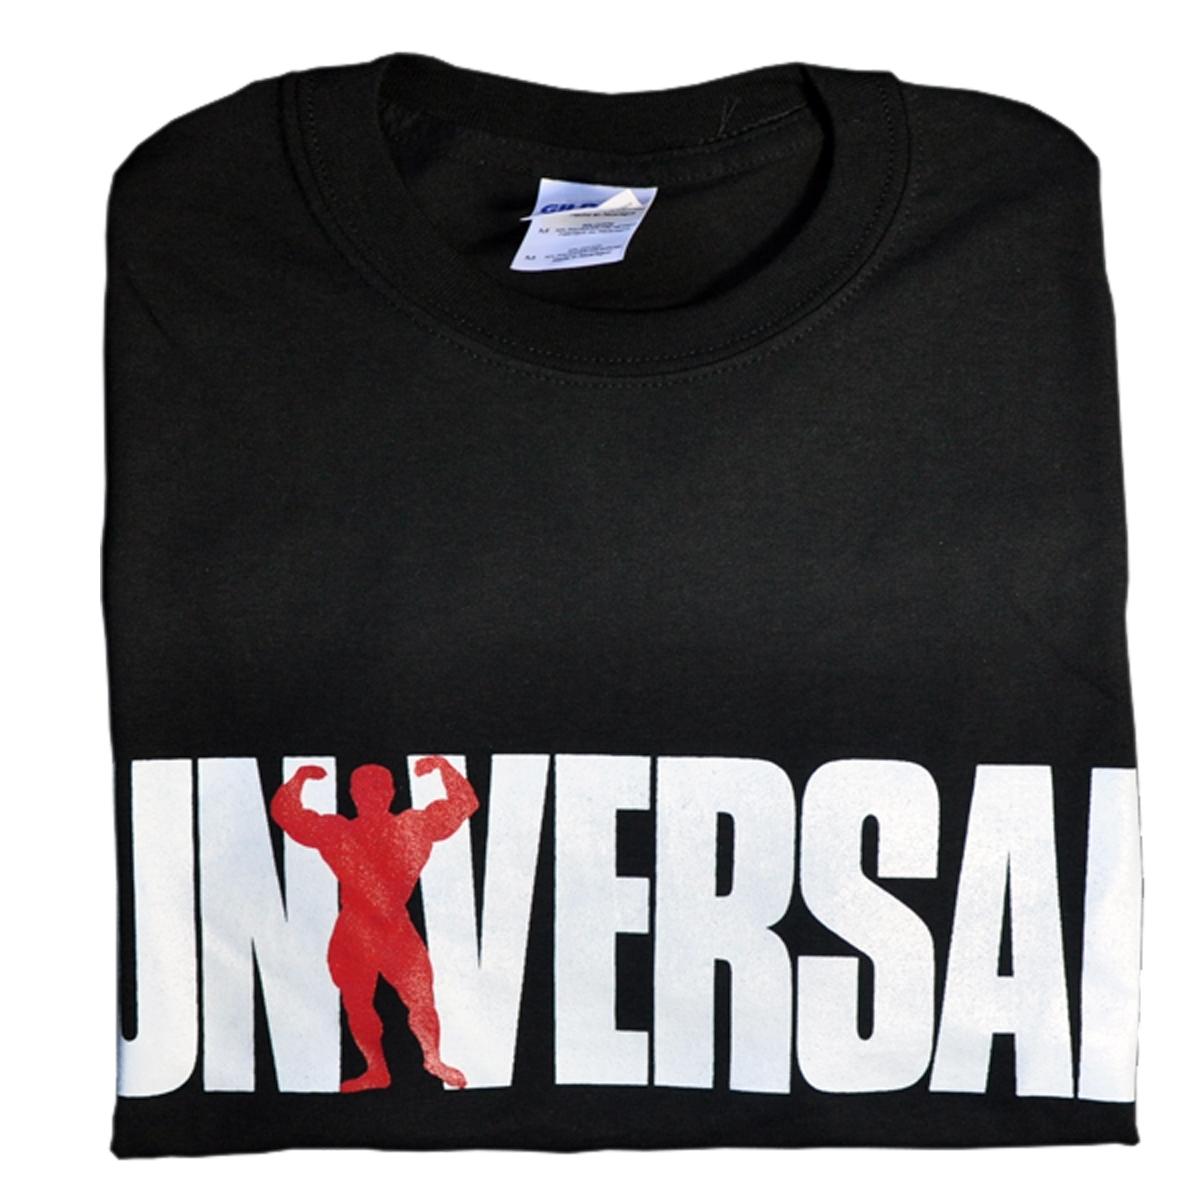 Universal Nutrition Black Logo T-Shirt Large